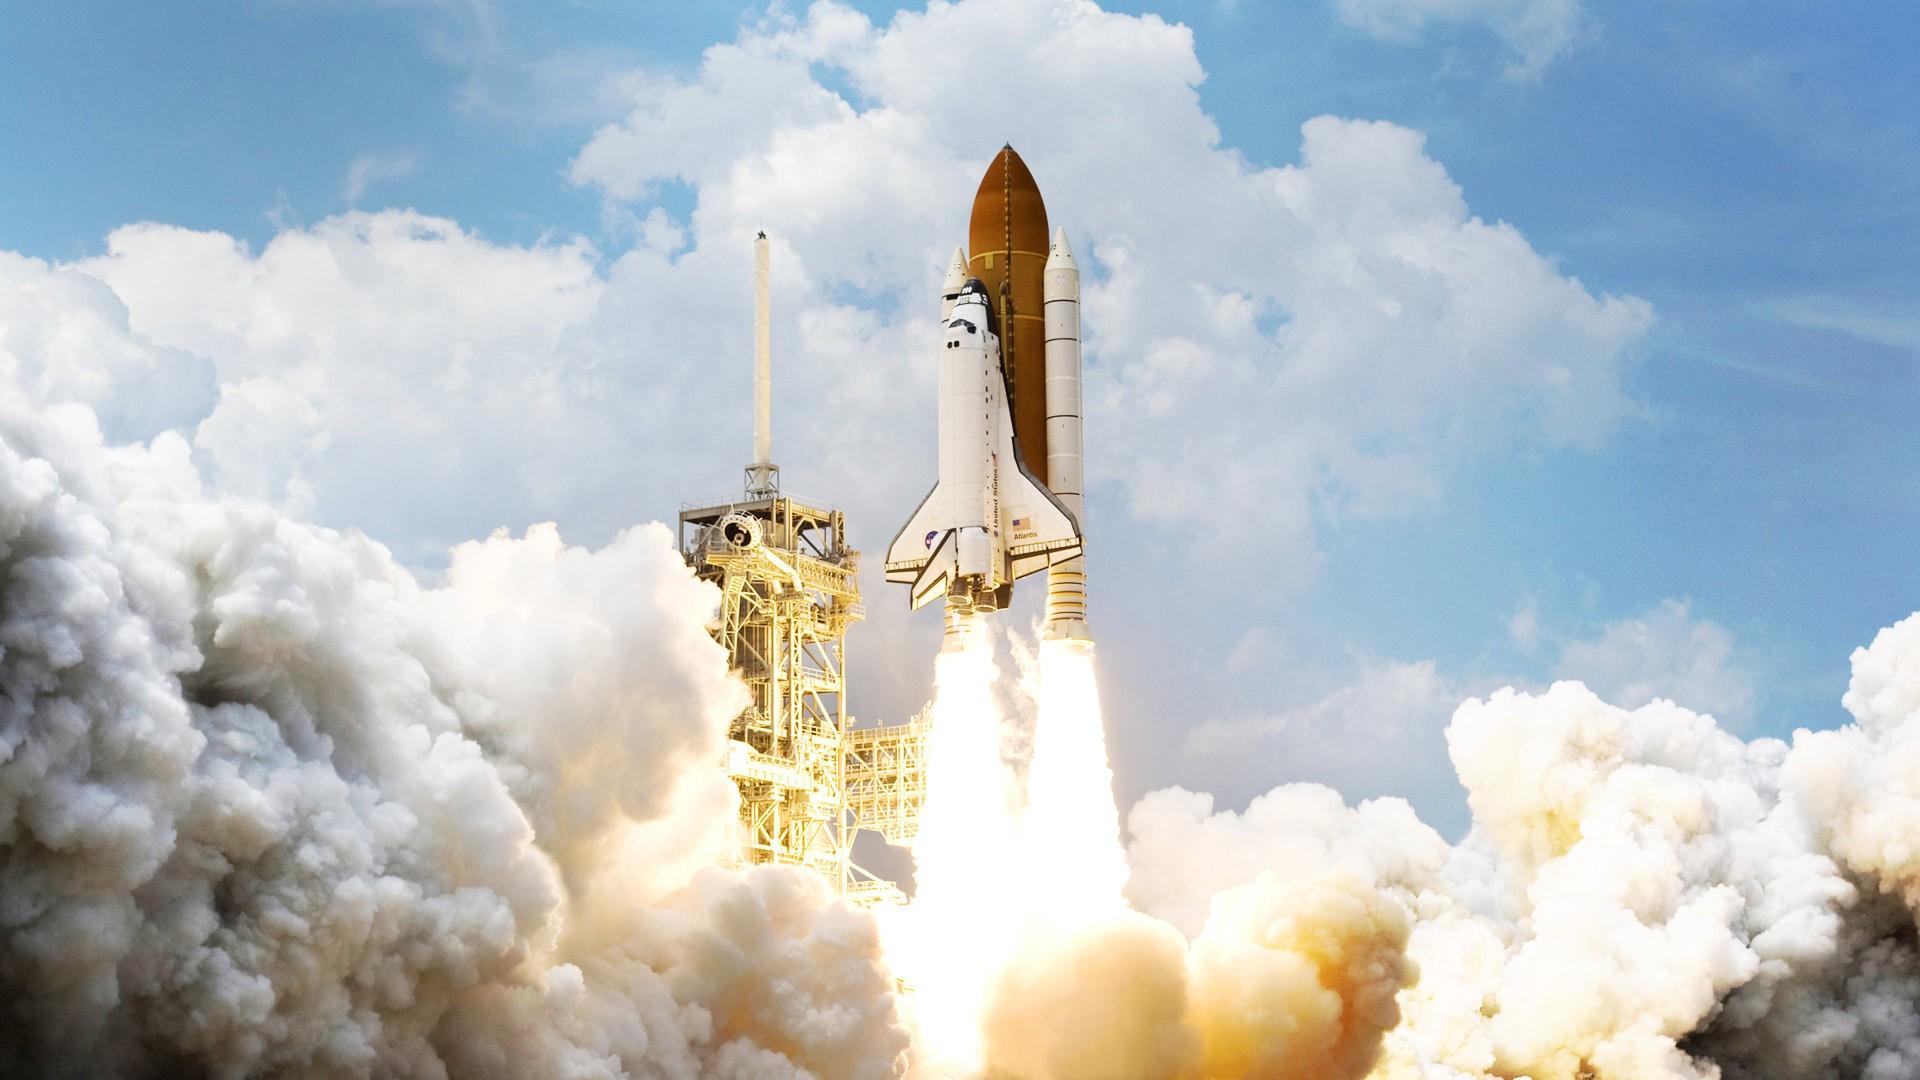 the core movie space shuttle landing - photo #13